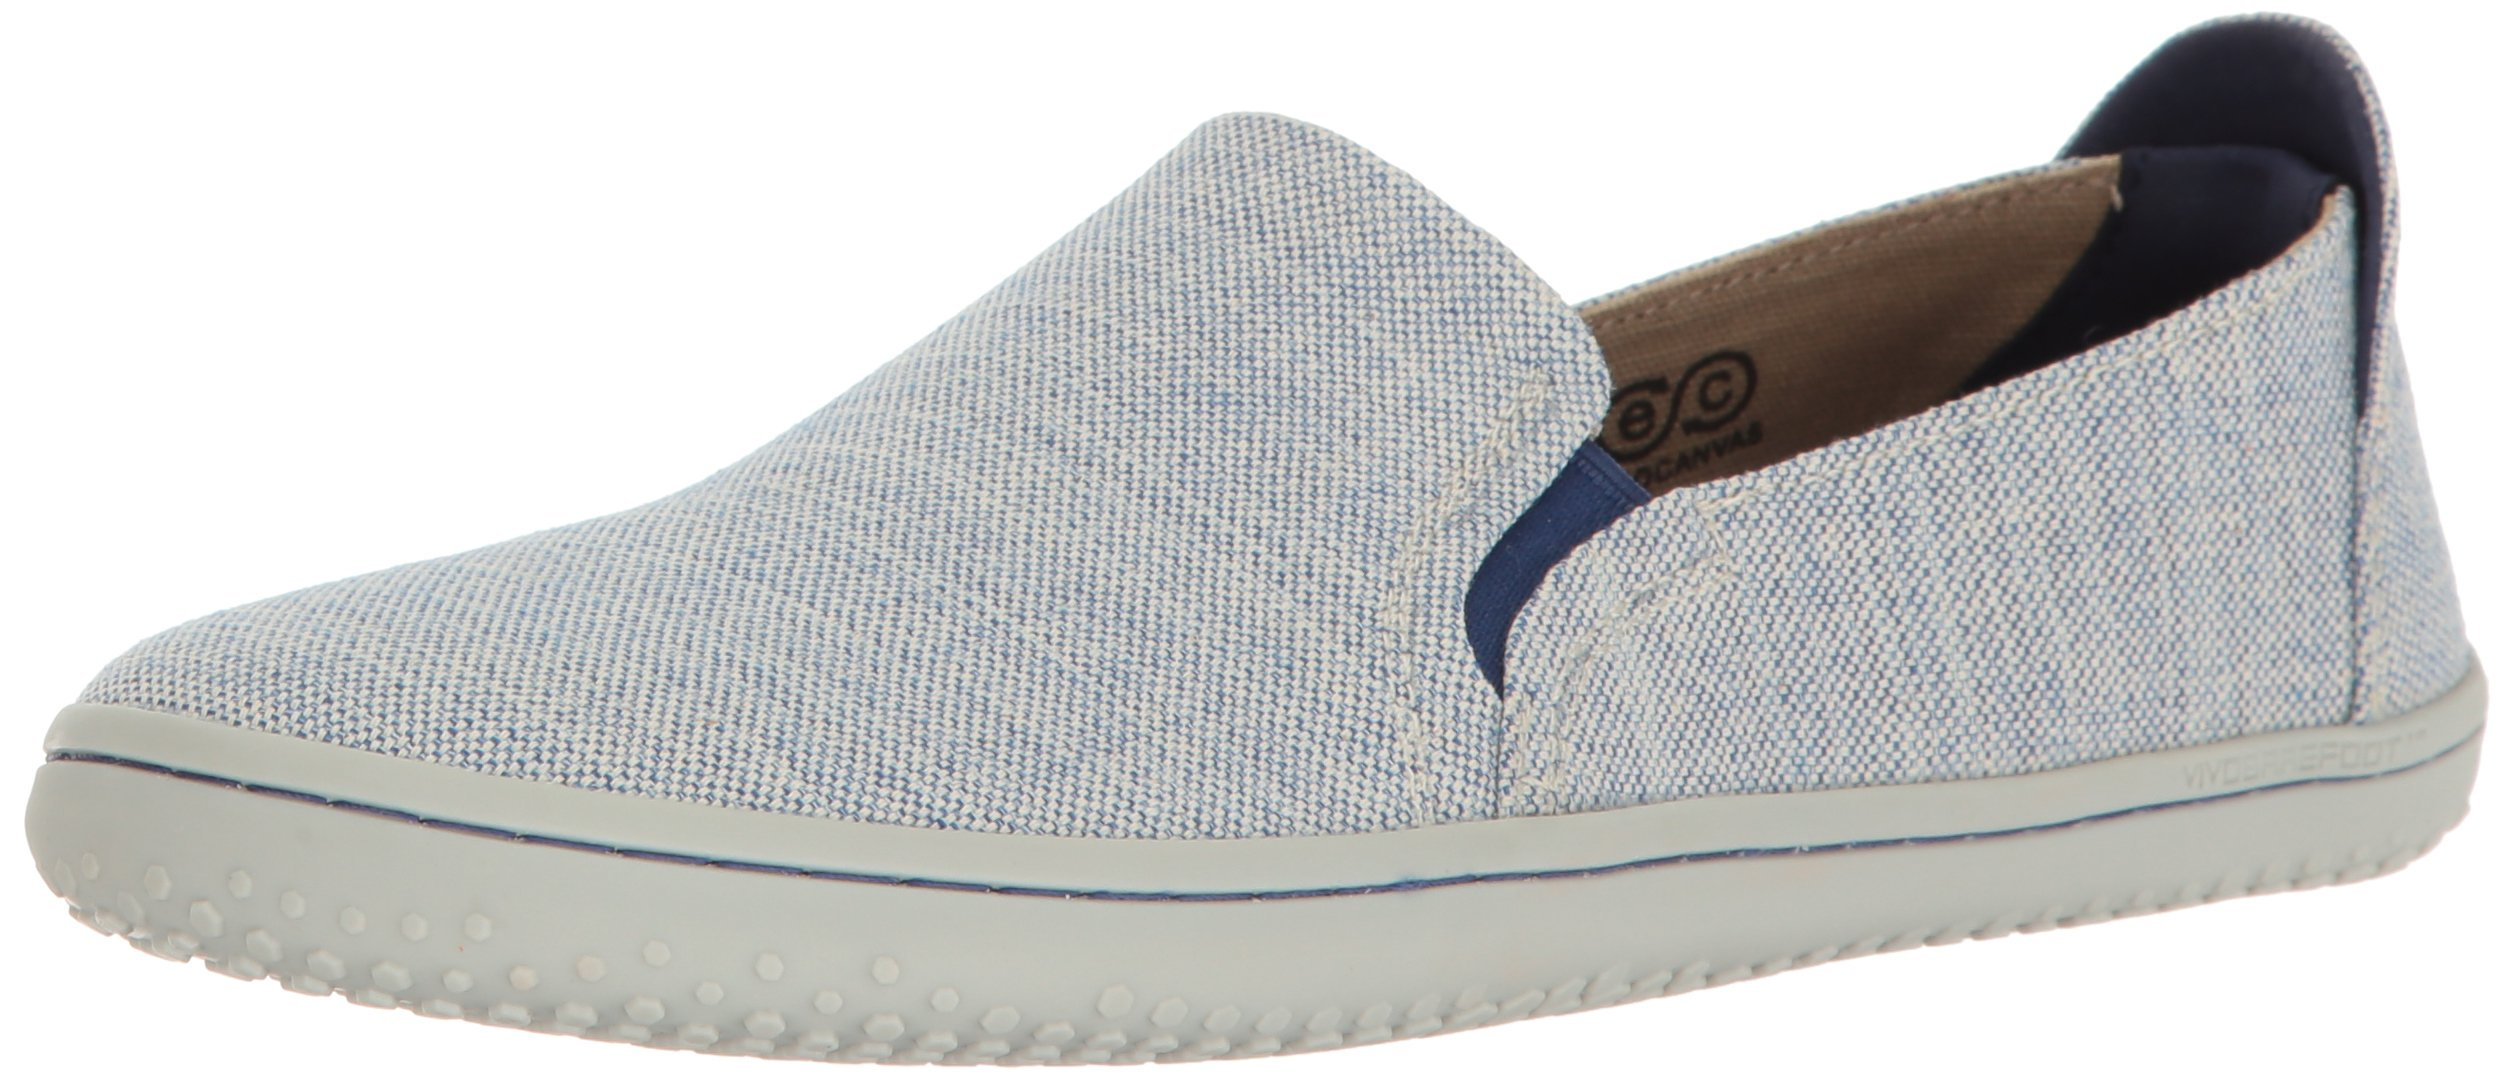 Vivobarefoot Women's Mata Slip-On Shoe Loafer, Blue, 41 D EU (10 US)